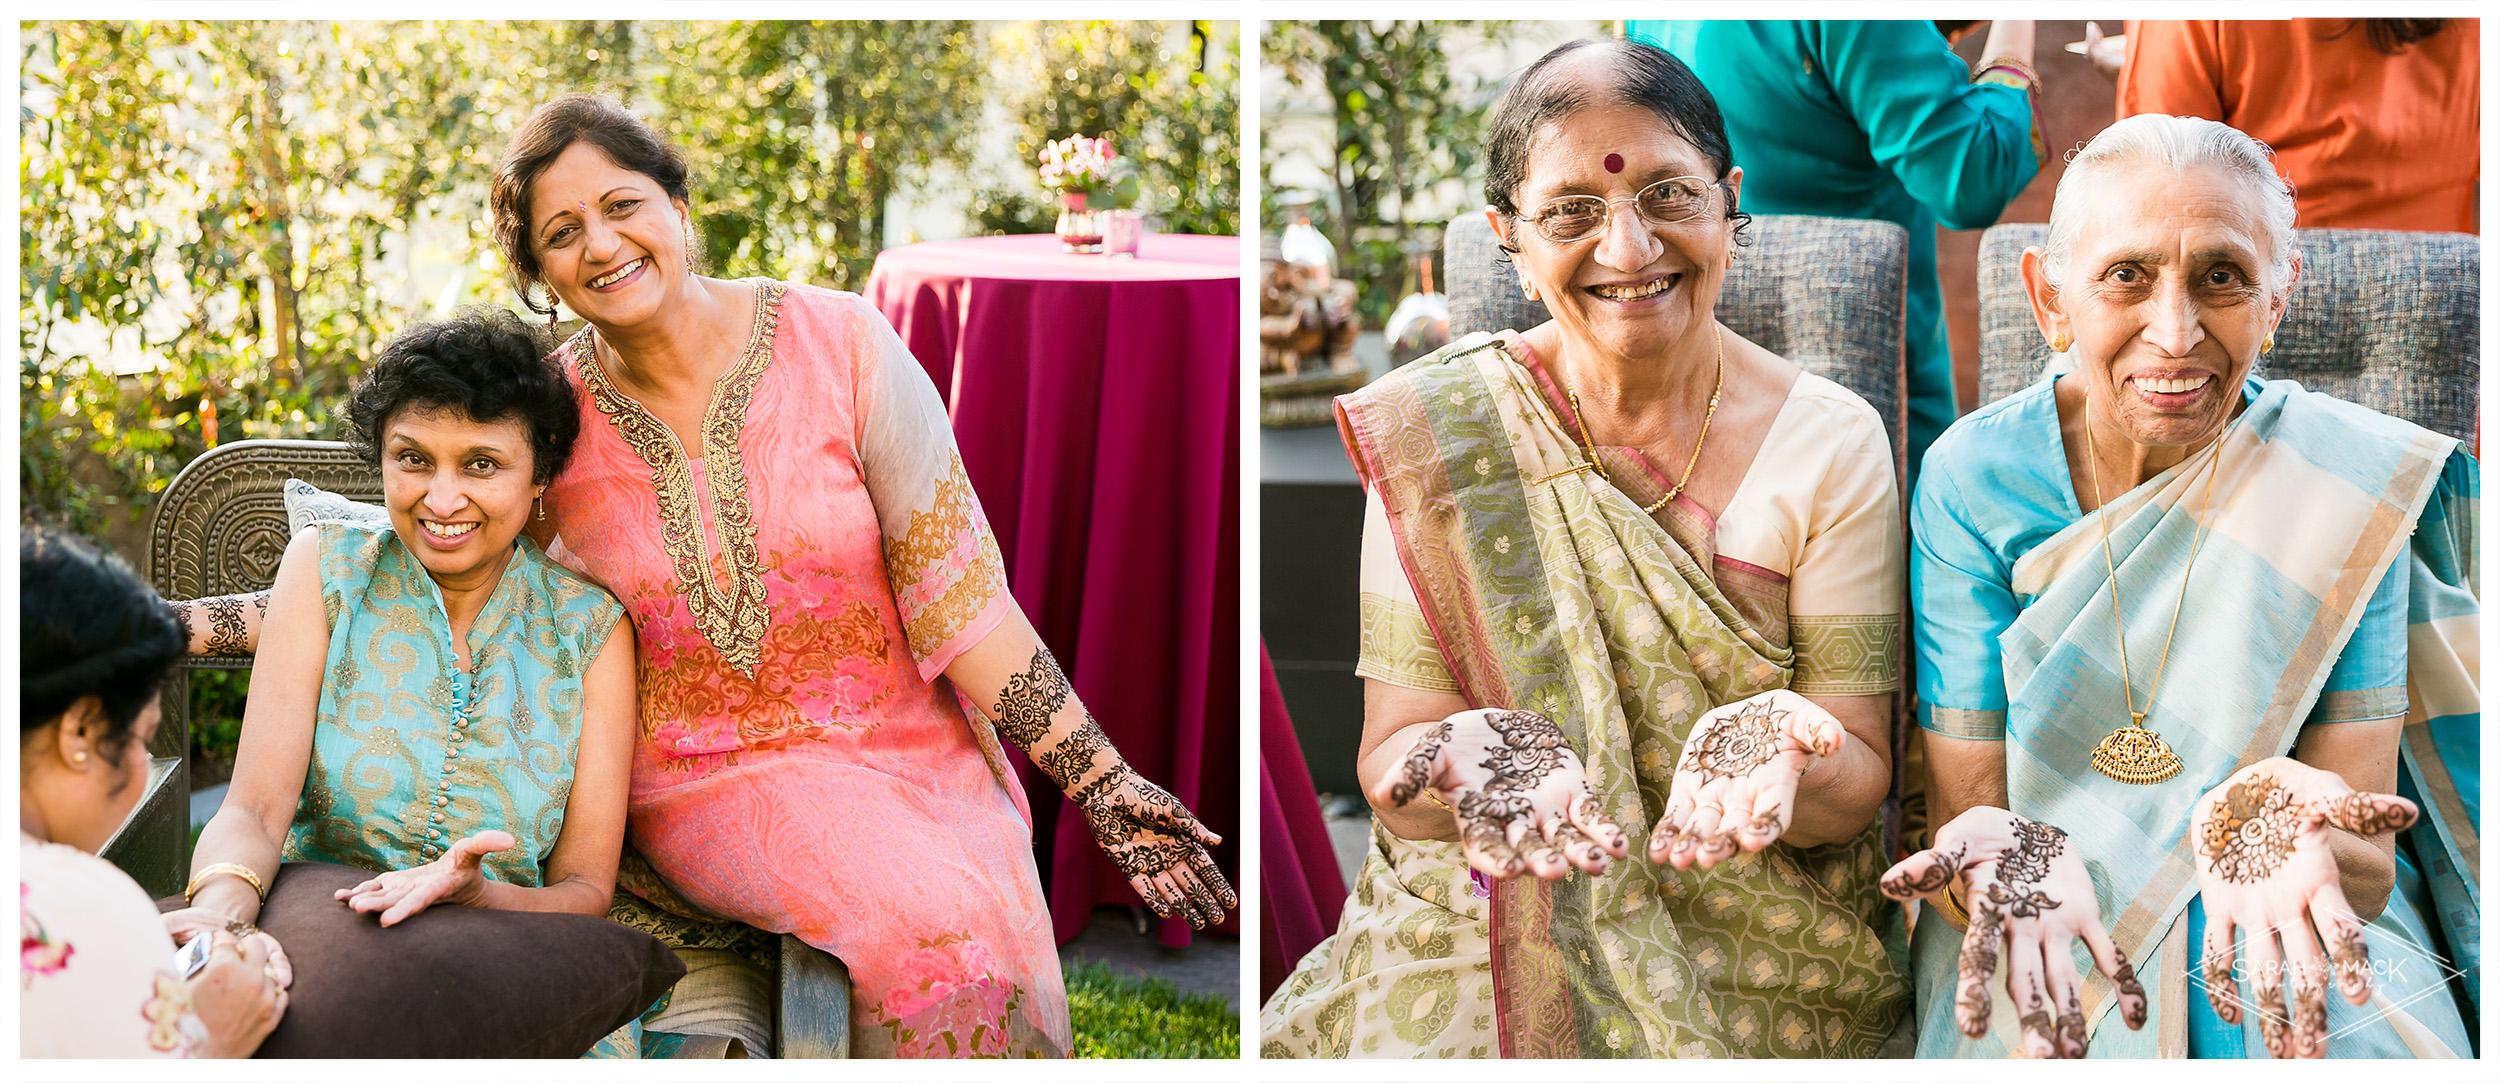 PR-Irvine-Mendhi-Indian-Wedding-Photography-13.jpg